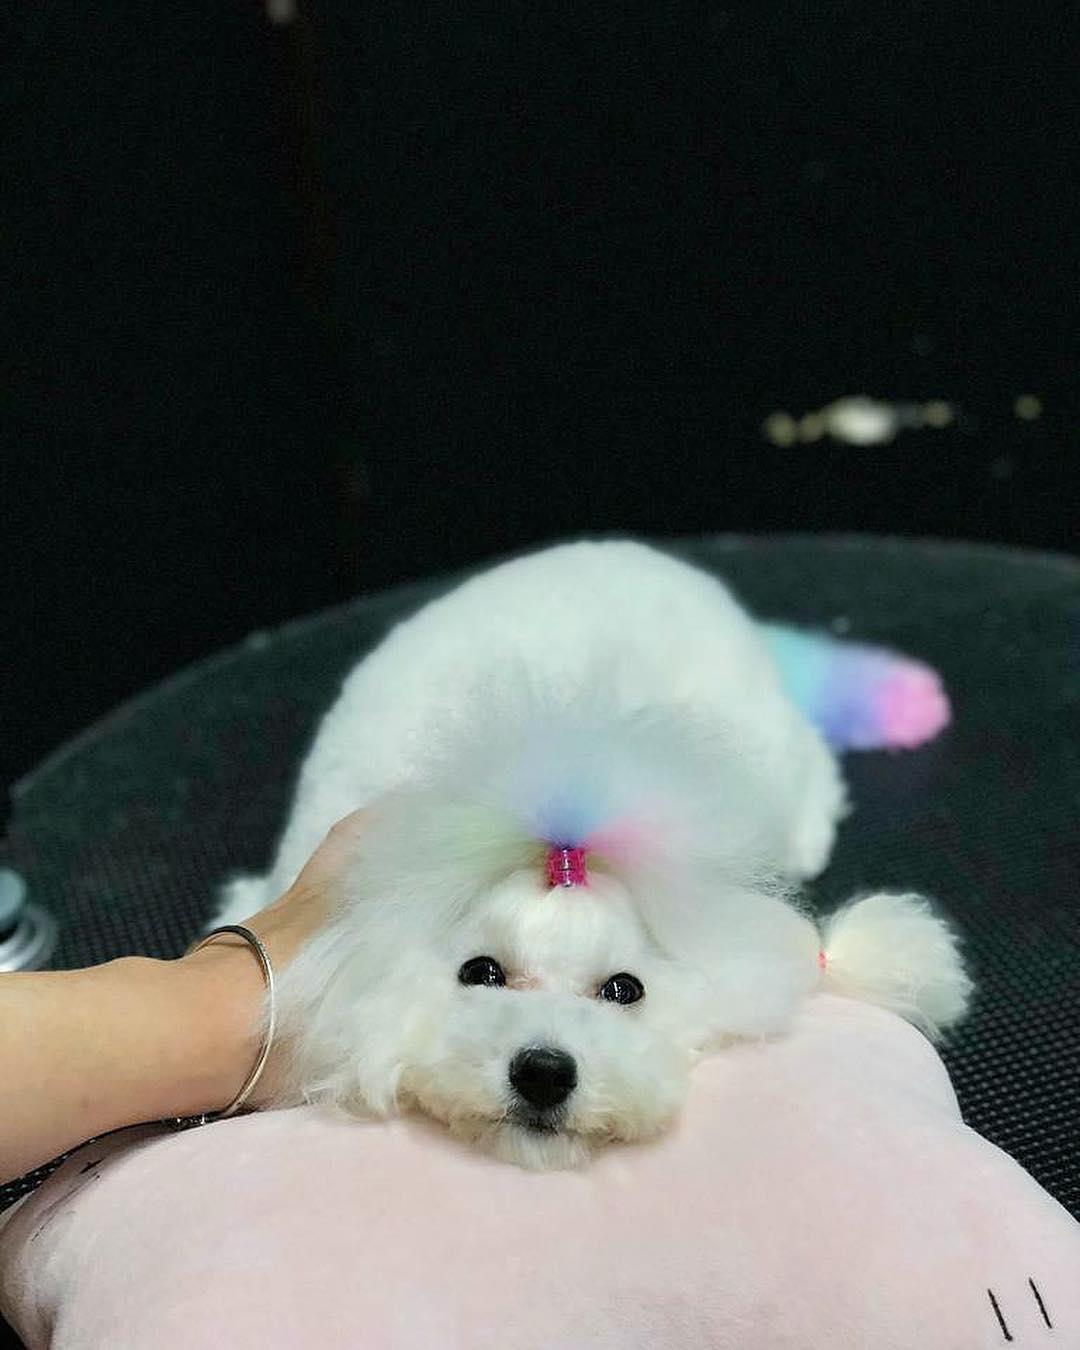 Pet grooming in Singapore - My Pet Image